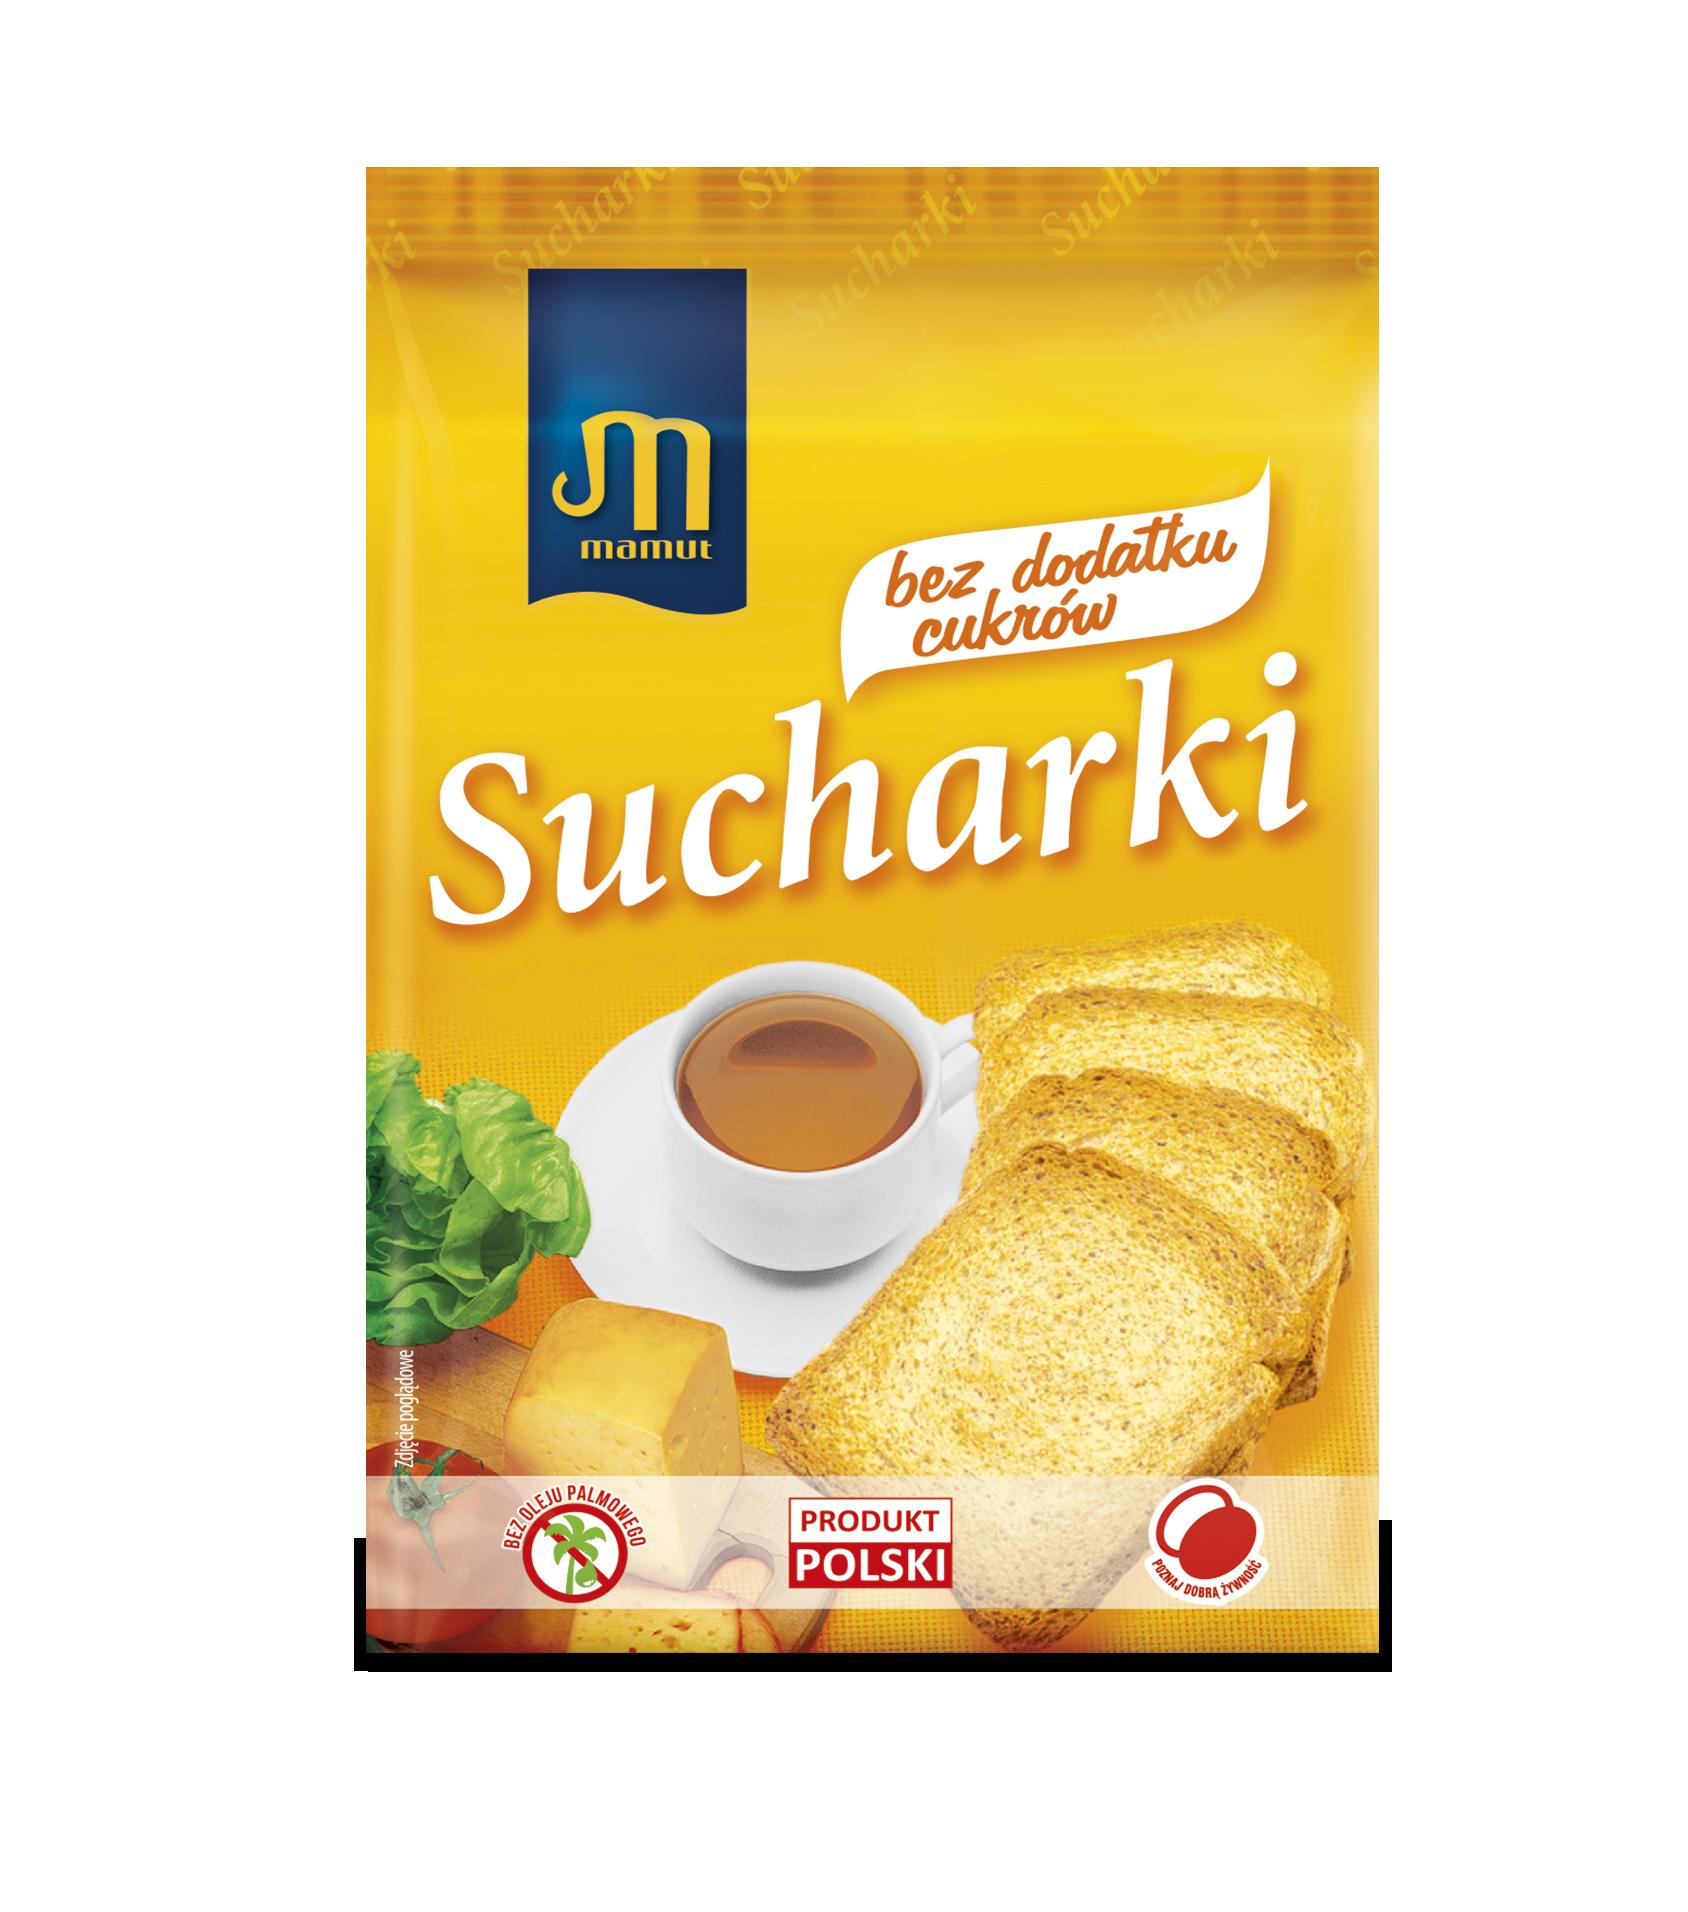 SUCHARKI-BEZ-DODATKU-CUKRÓW-225g-FRONT